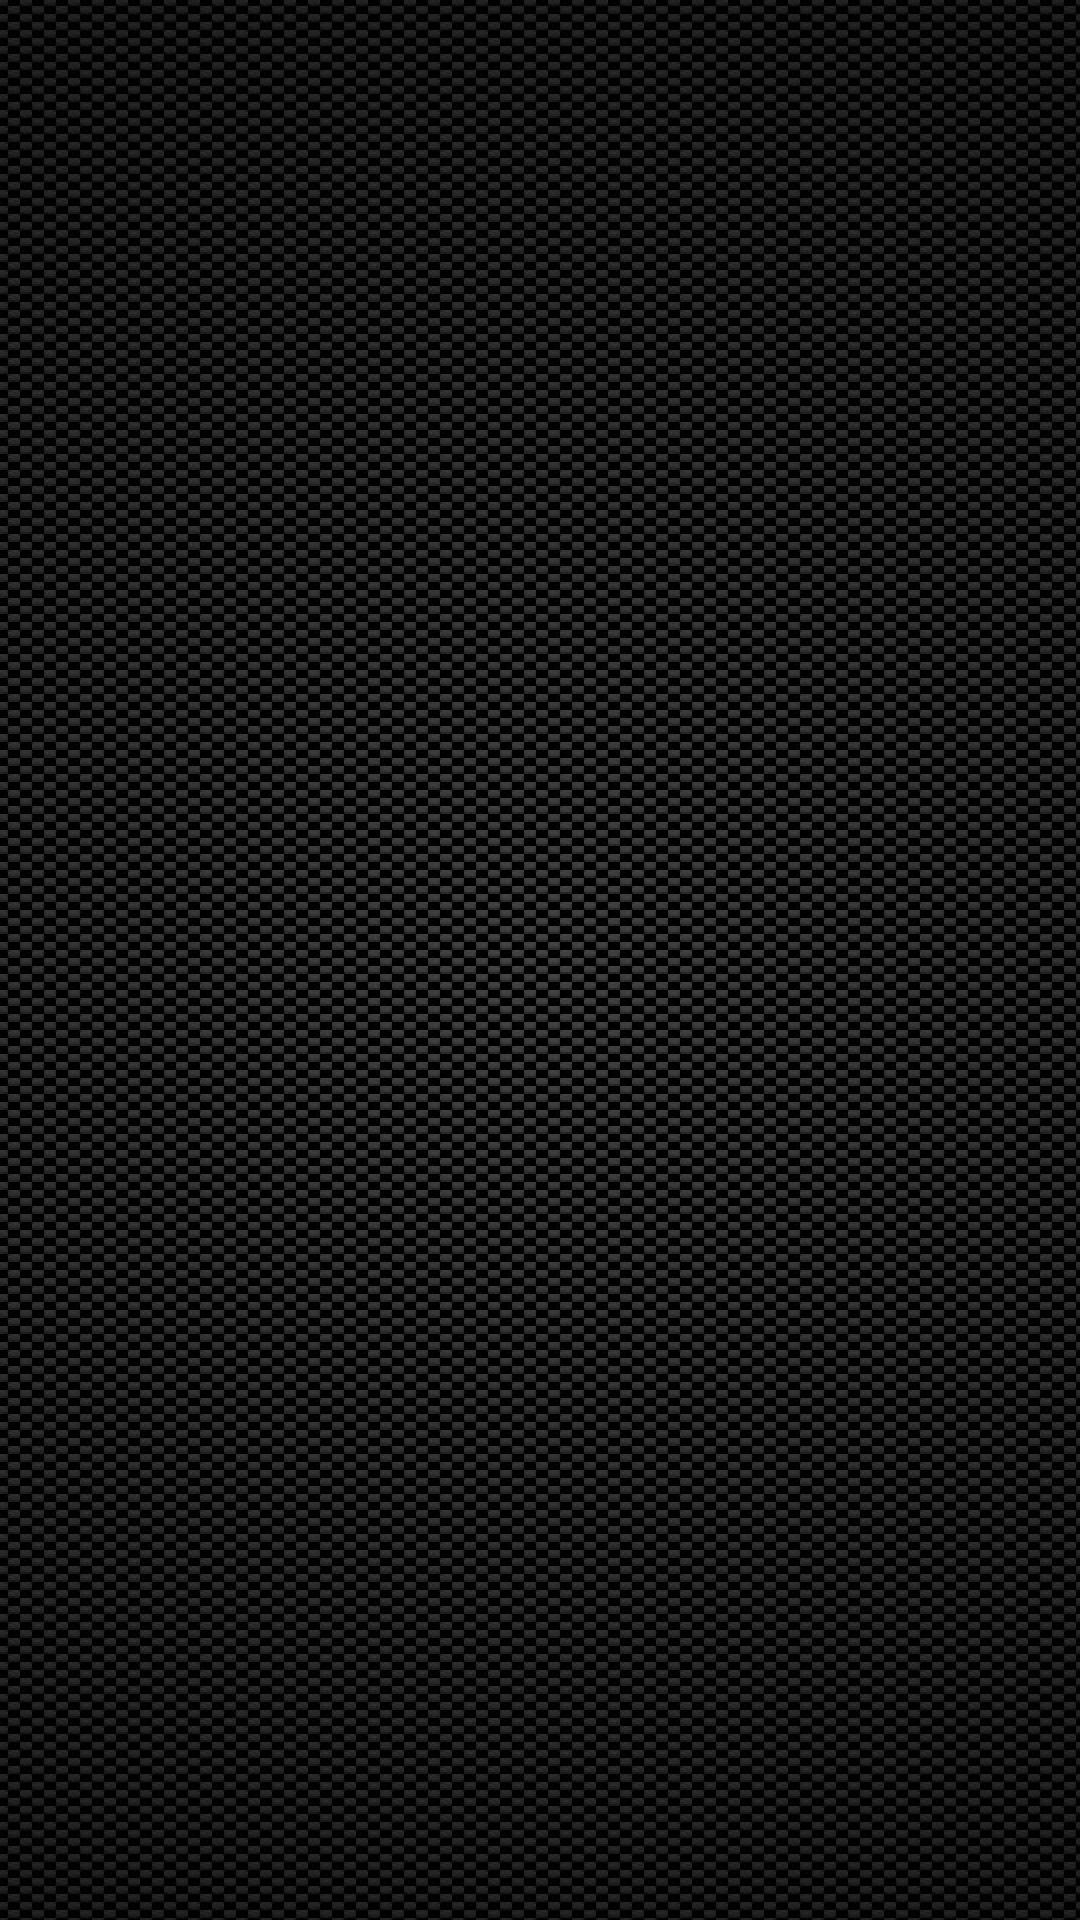 Black carbon fiber iphone 4 wallpaper iphone4 wallpapers org 1080x1920